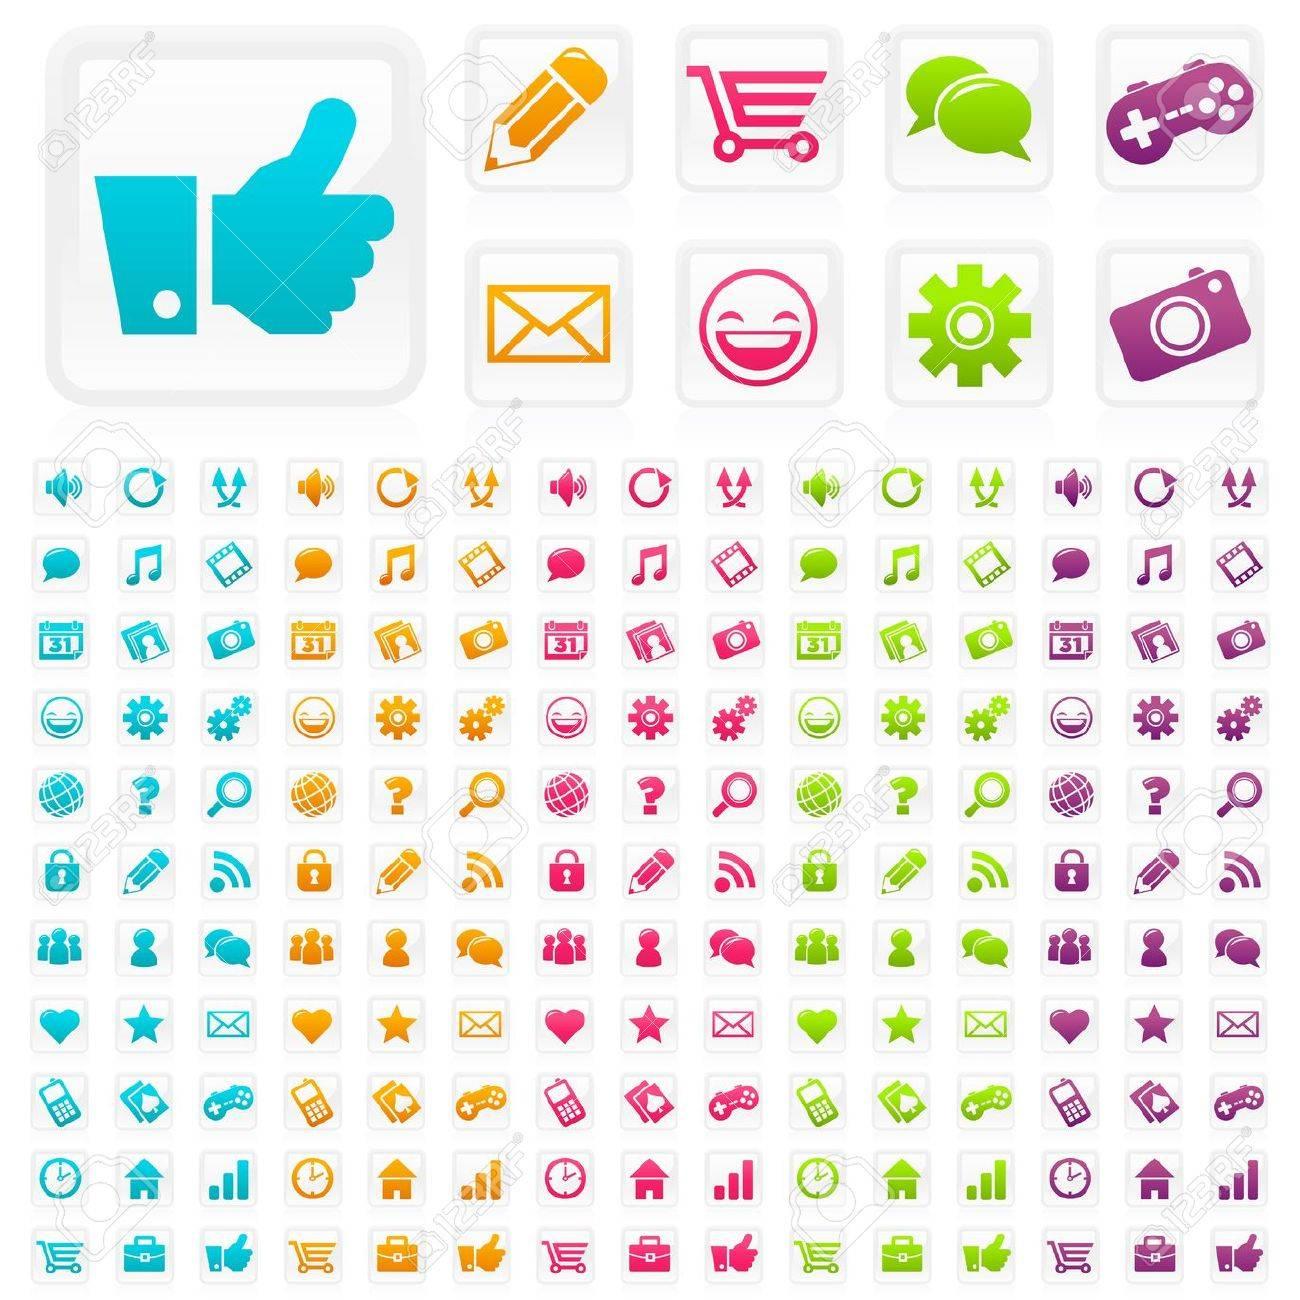 Social Media Icons Stock Vector - 11406313